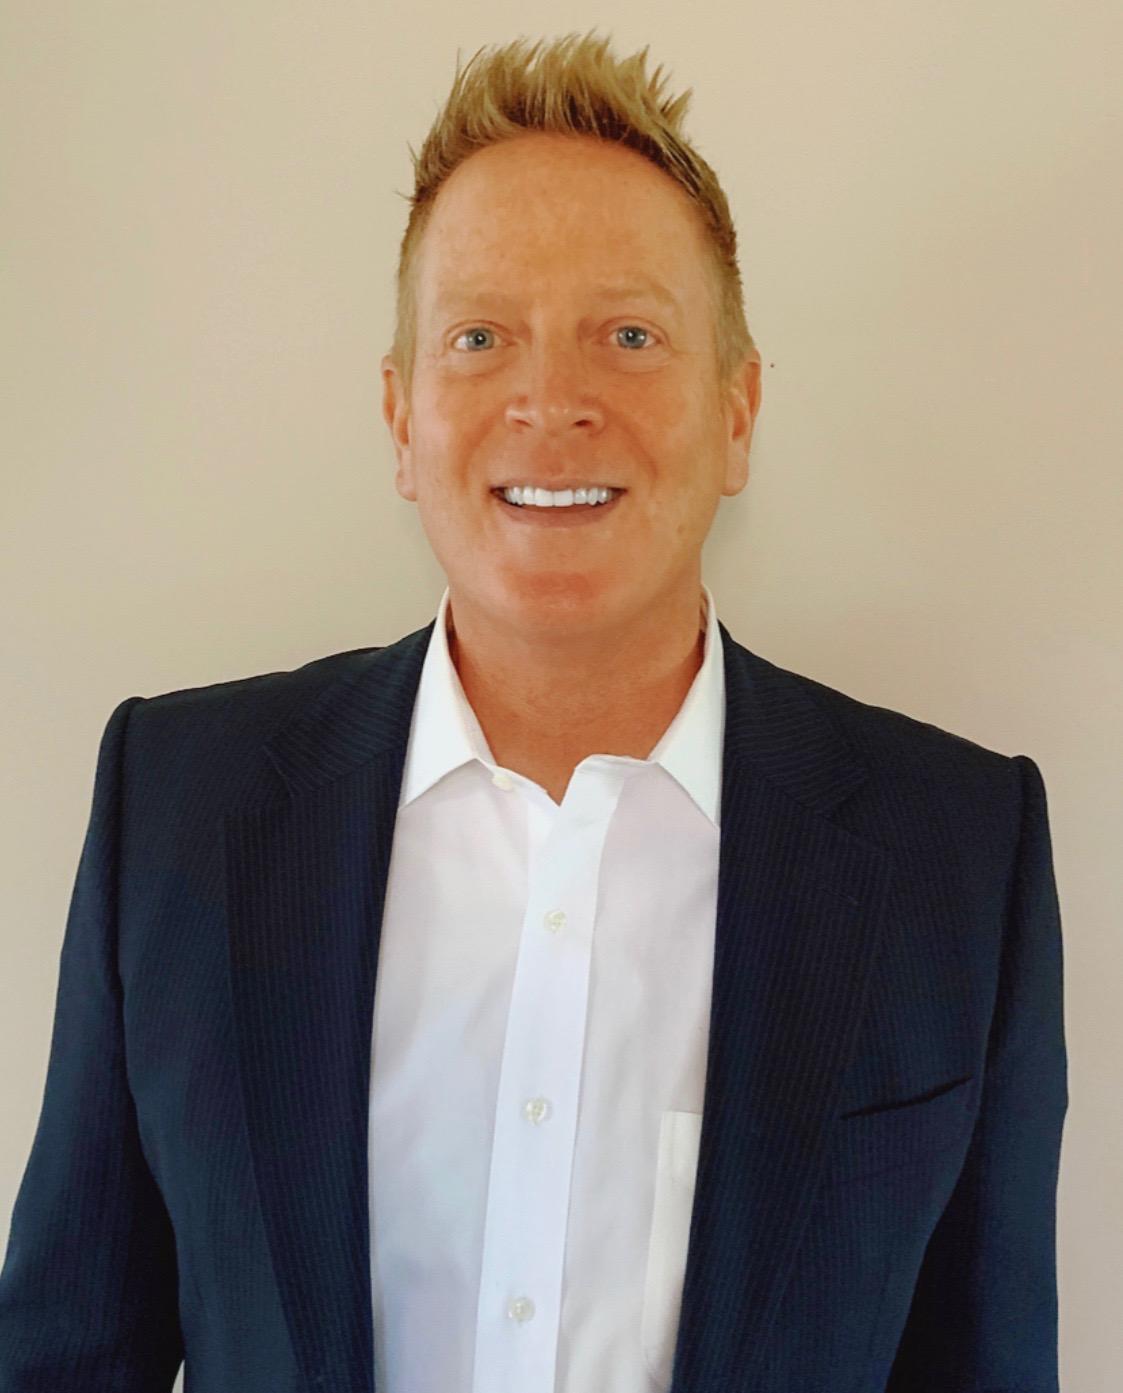 Mark Dubec, Resident Therapist